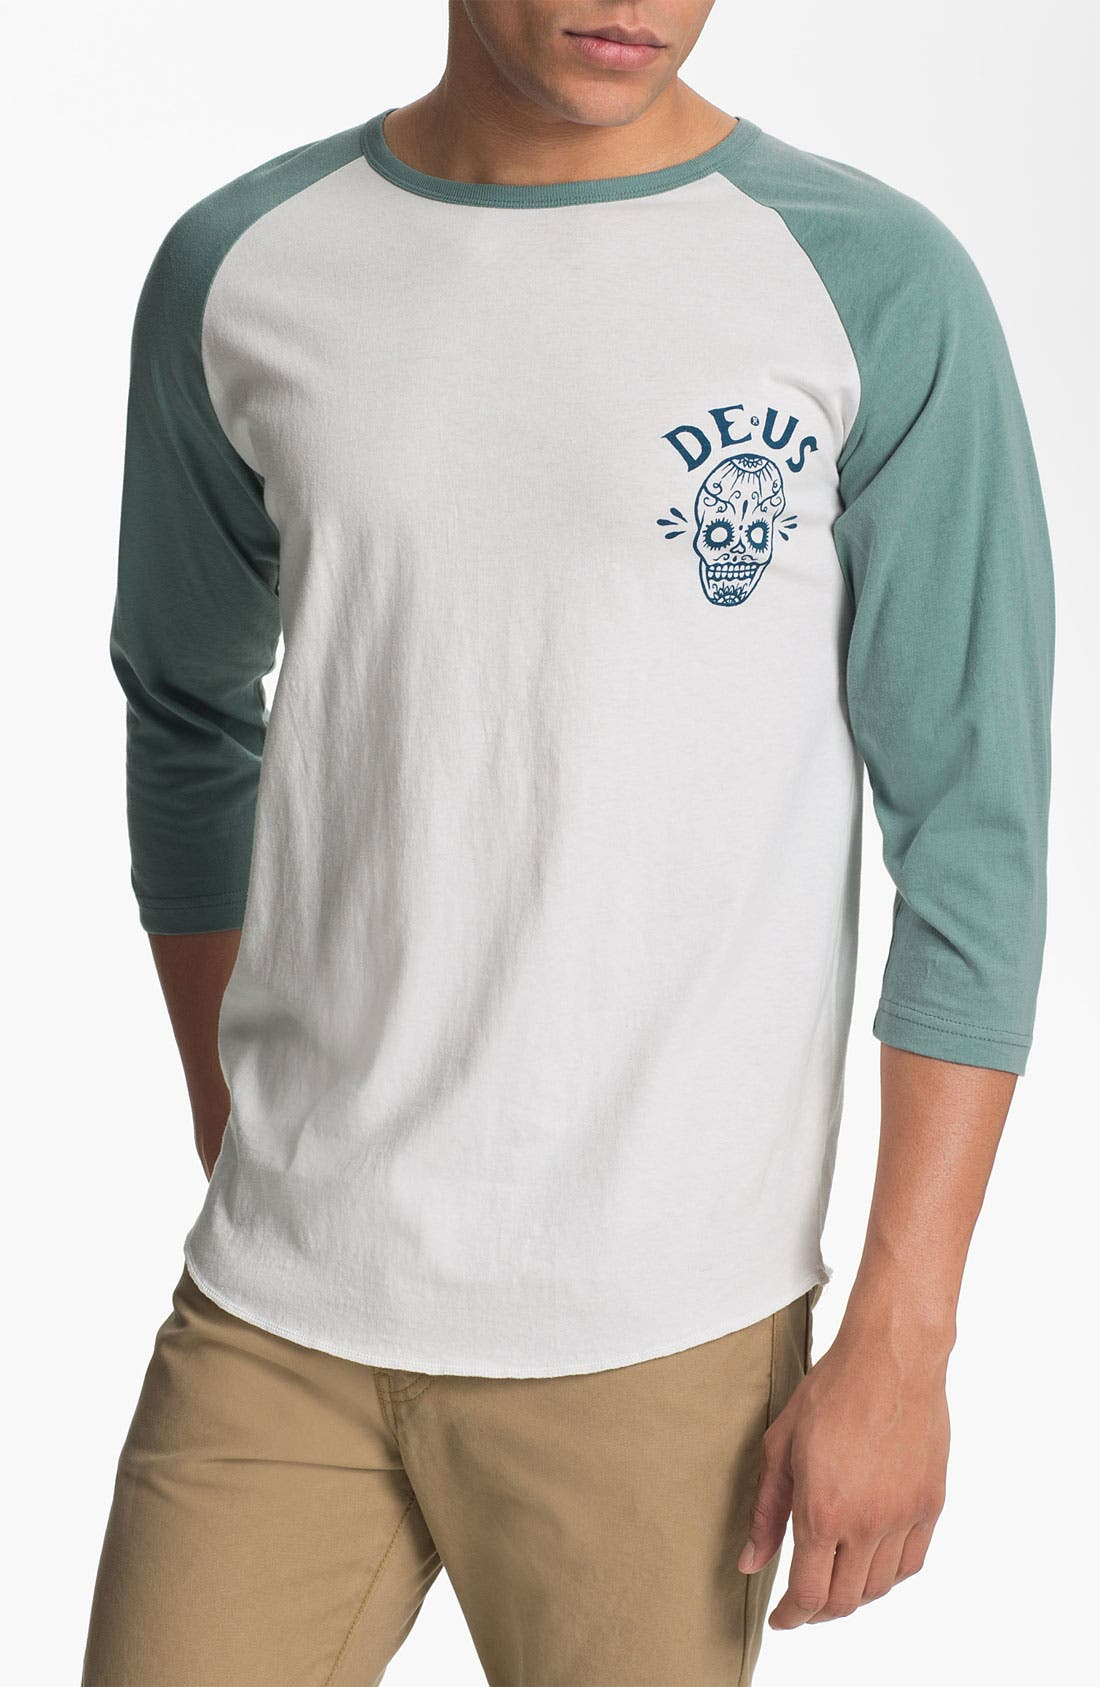 Alternate Image 1 Selected - Deus Ex Machina 'Deus of the Dead' Graphic Baseball T-Shirt